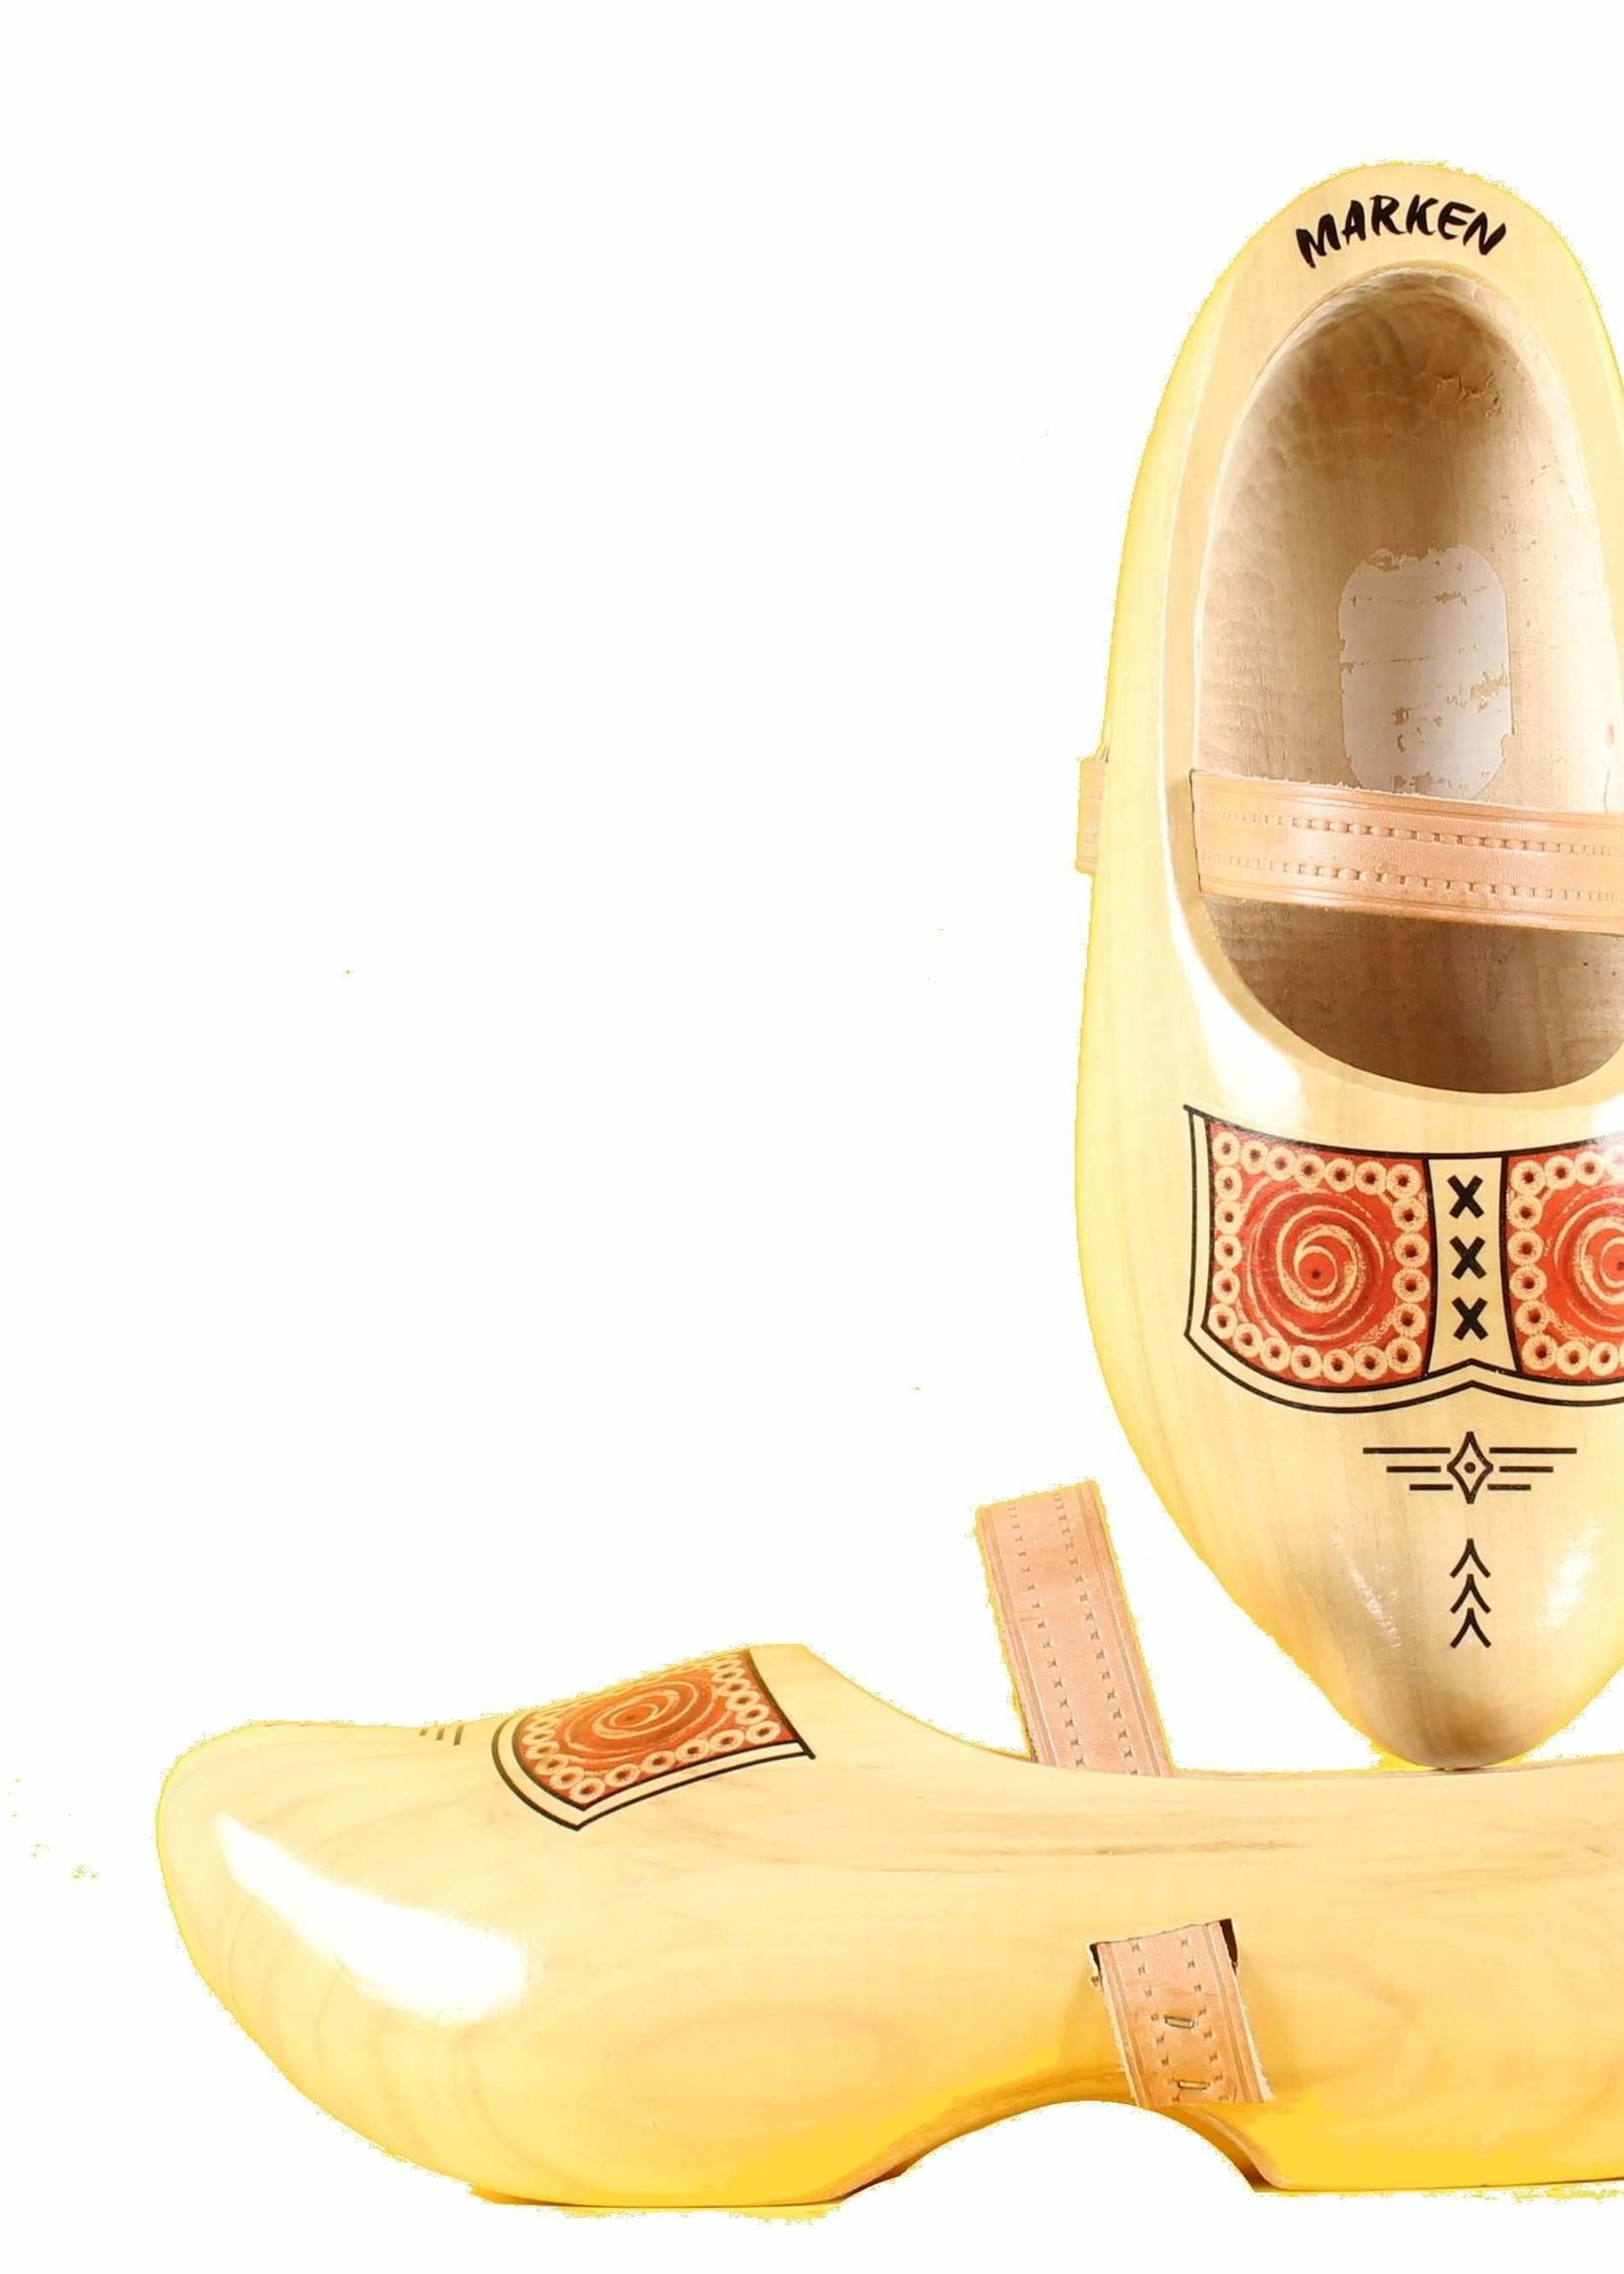 Wooden Shoe Factory Marken Wooden Shoes Tripklomp Farmer, Leather Strap Clog